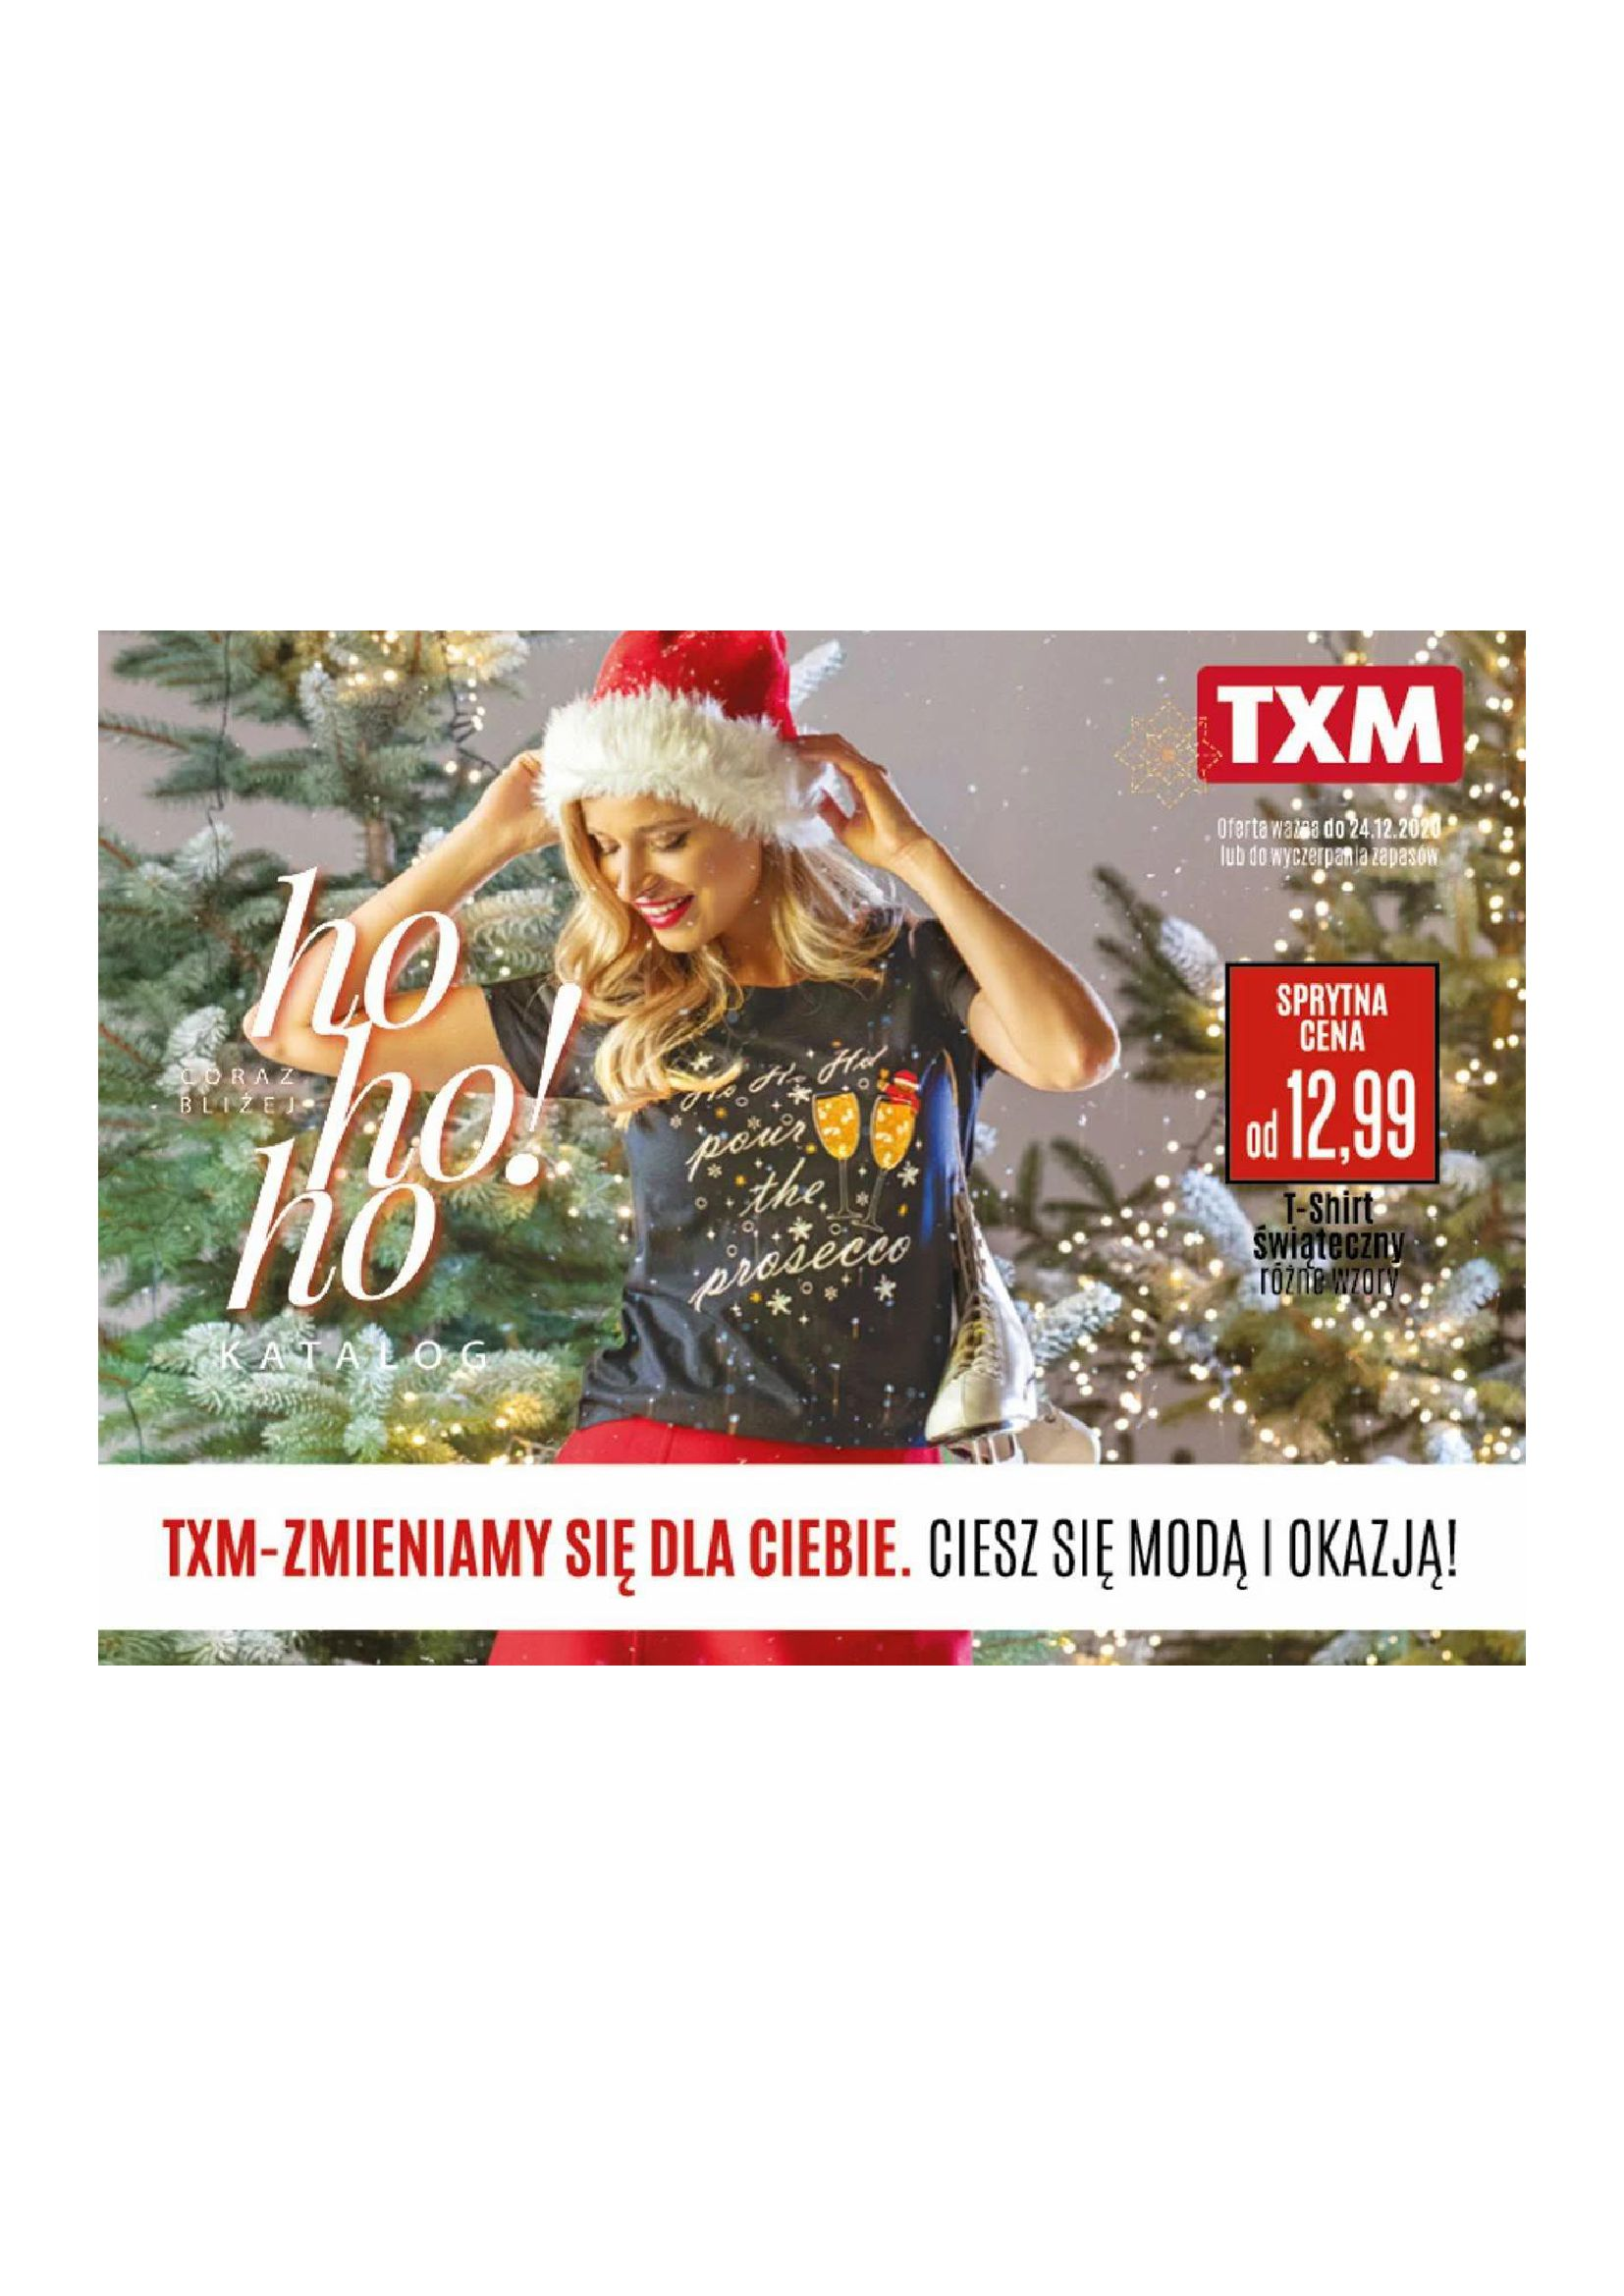 TXM textilmarket:  Katalog Świąteczny 09.11.2020